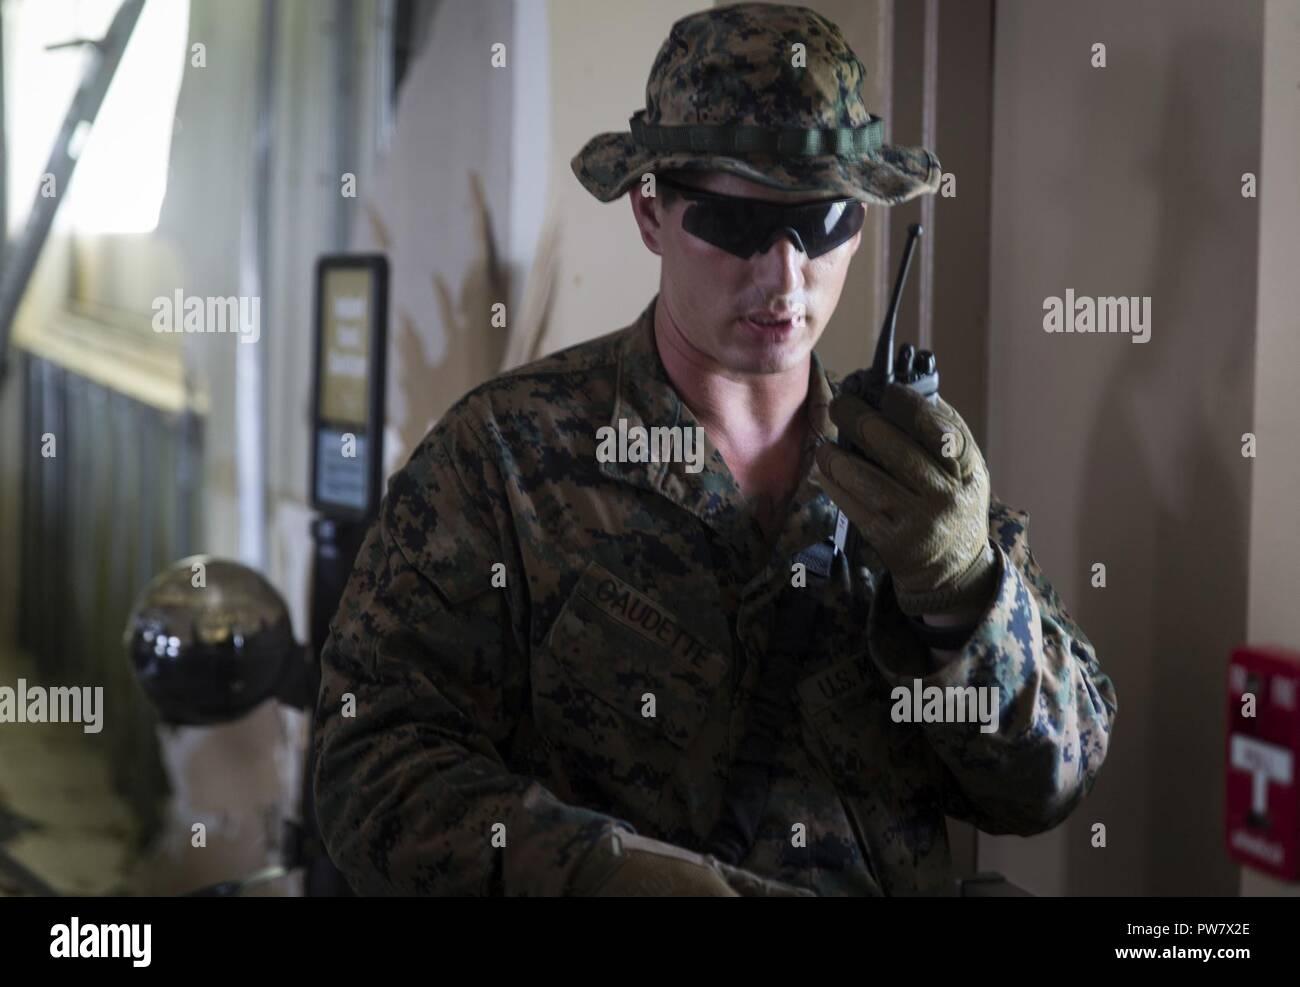 Us Marine Sgt David Gaudette With Joint Task Force Leeward